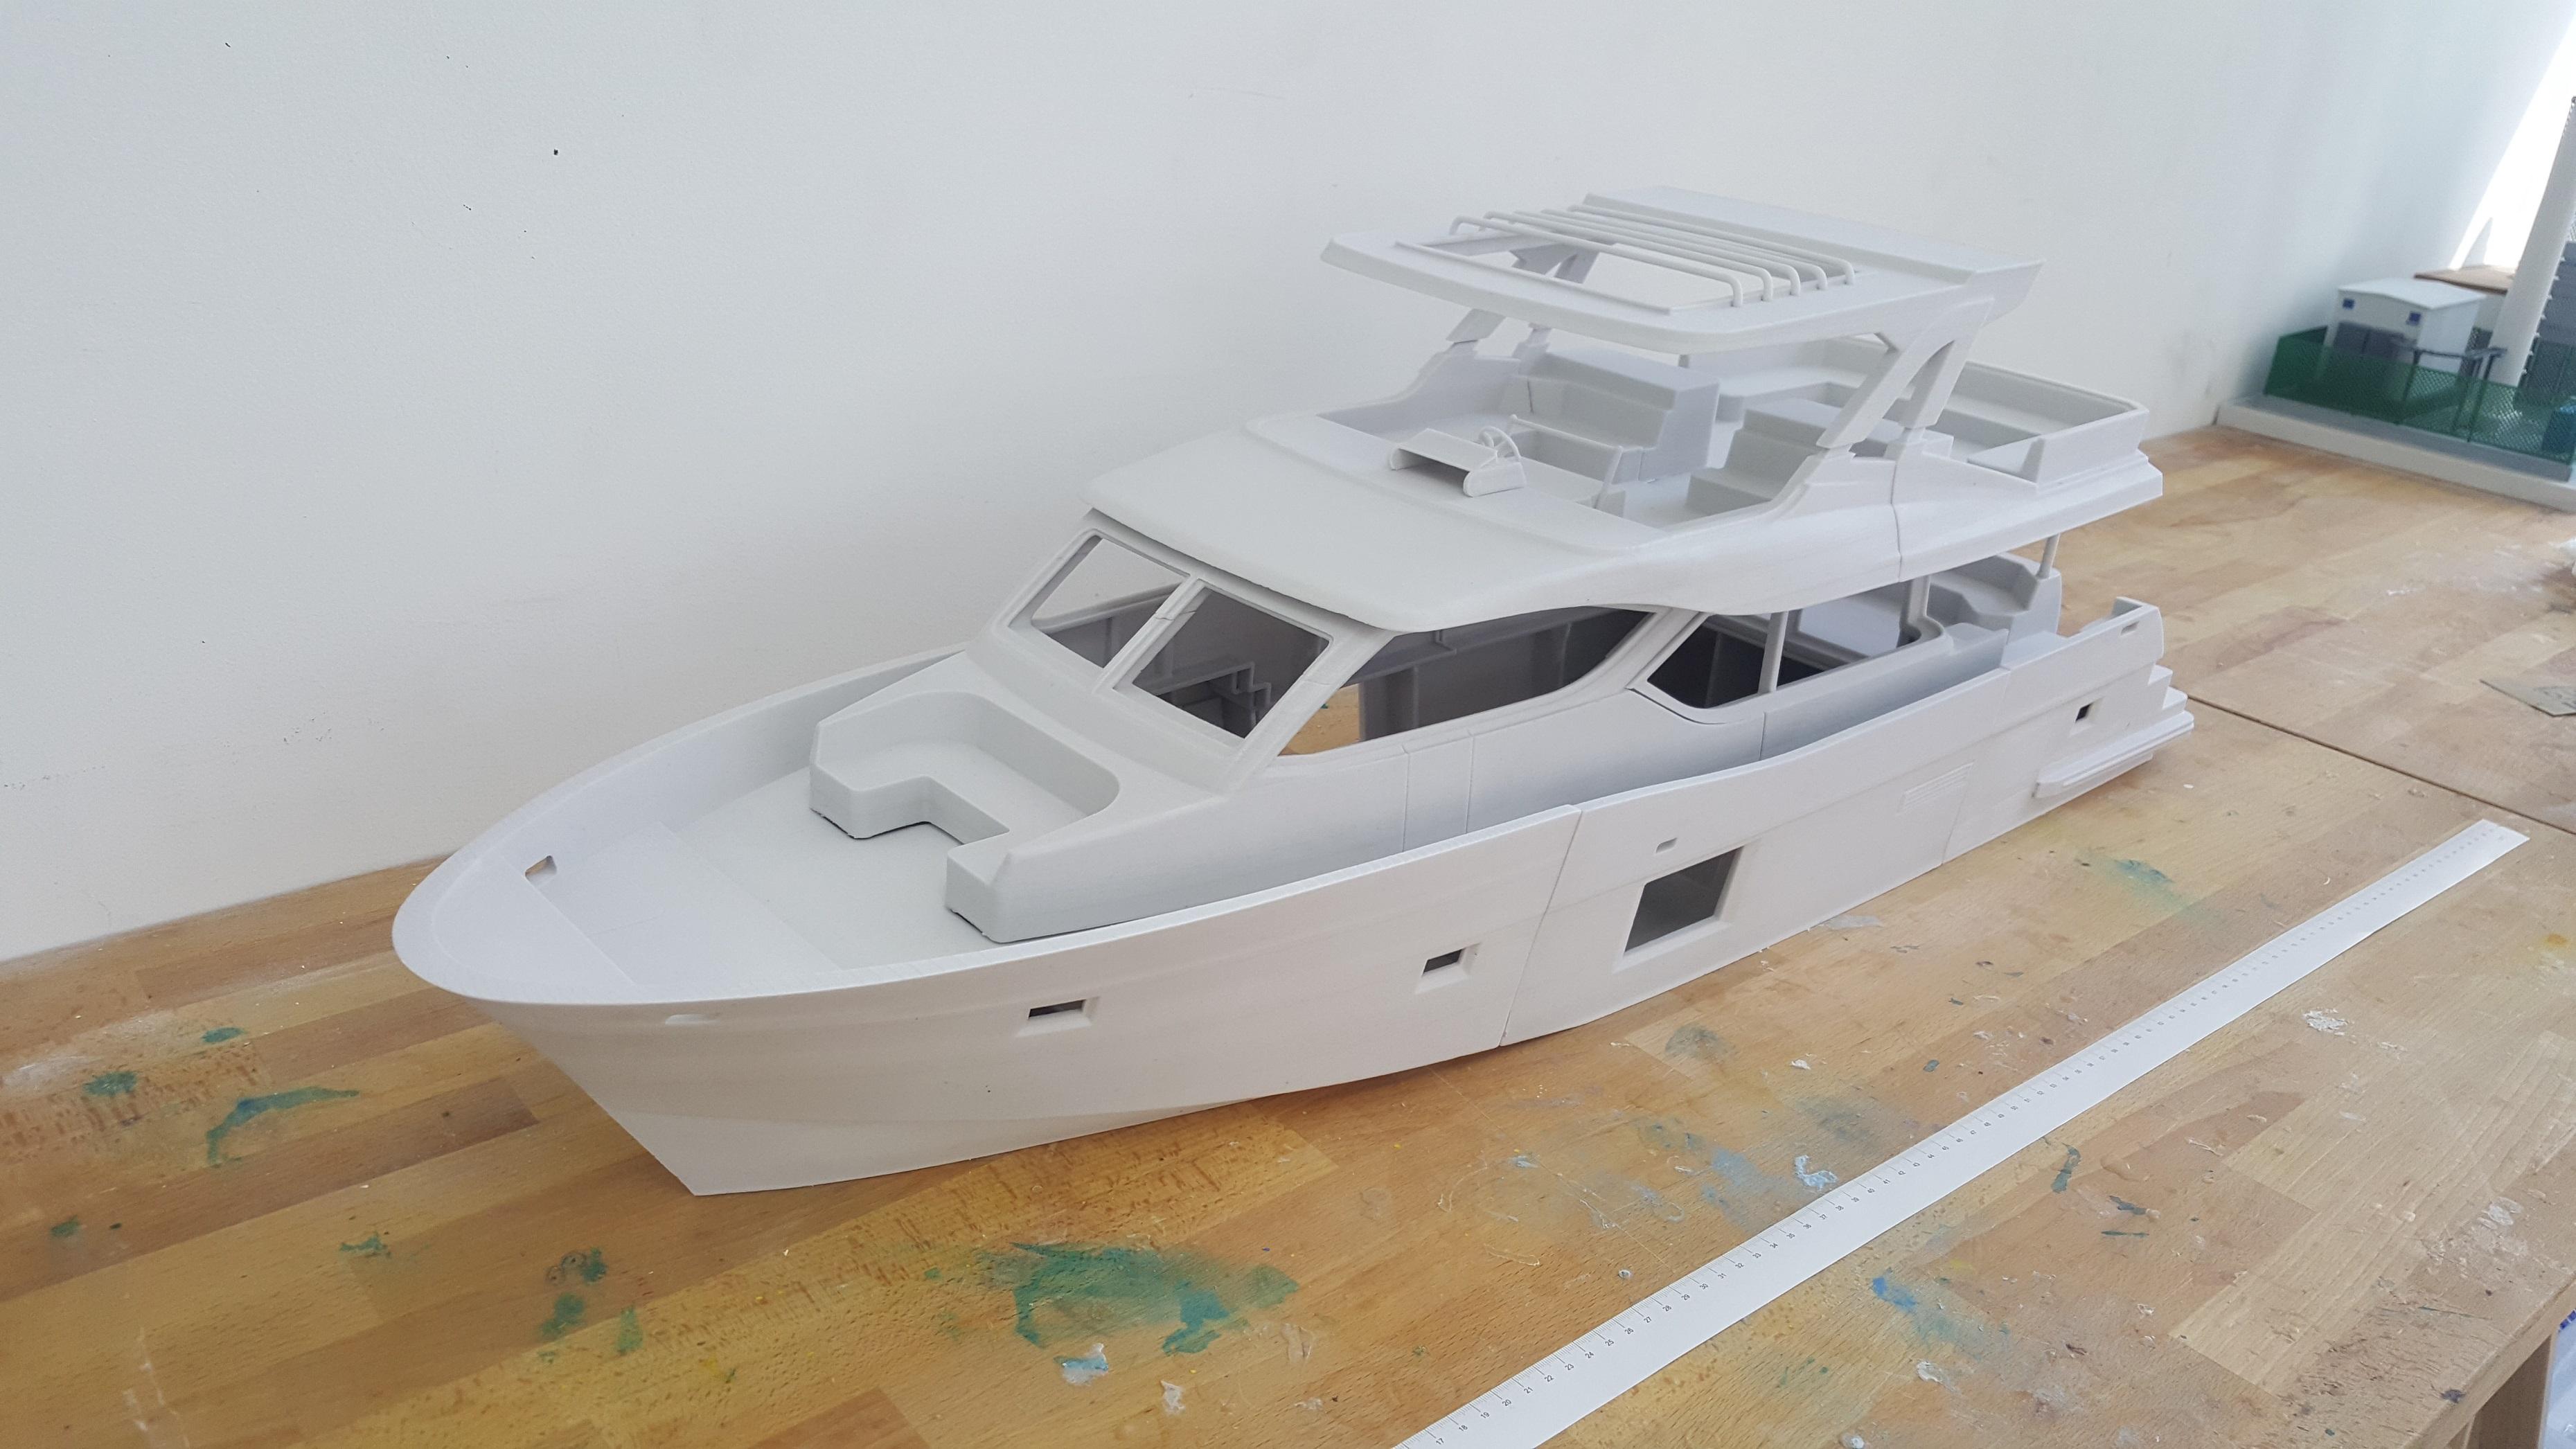 3d Printed Transport Models Generation 3d